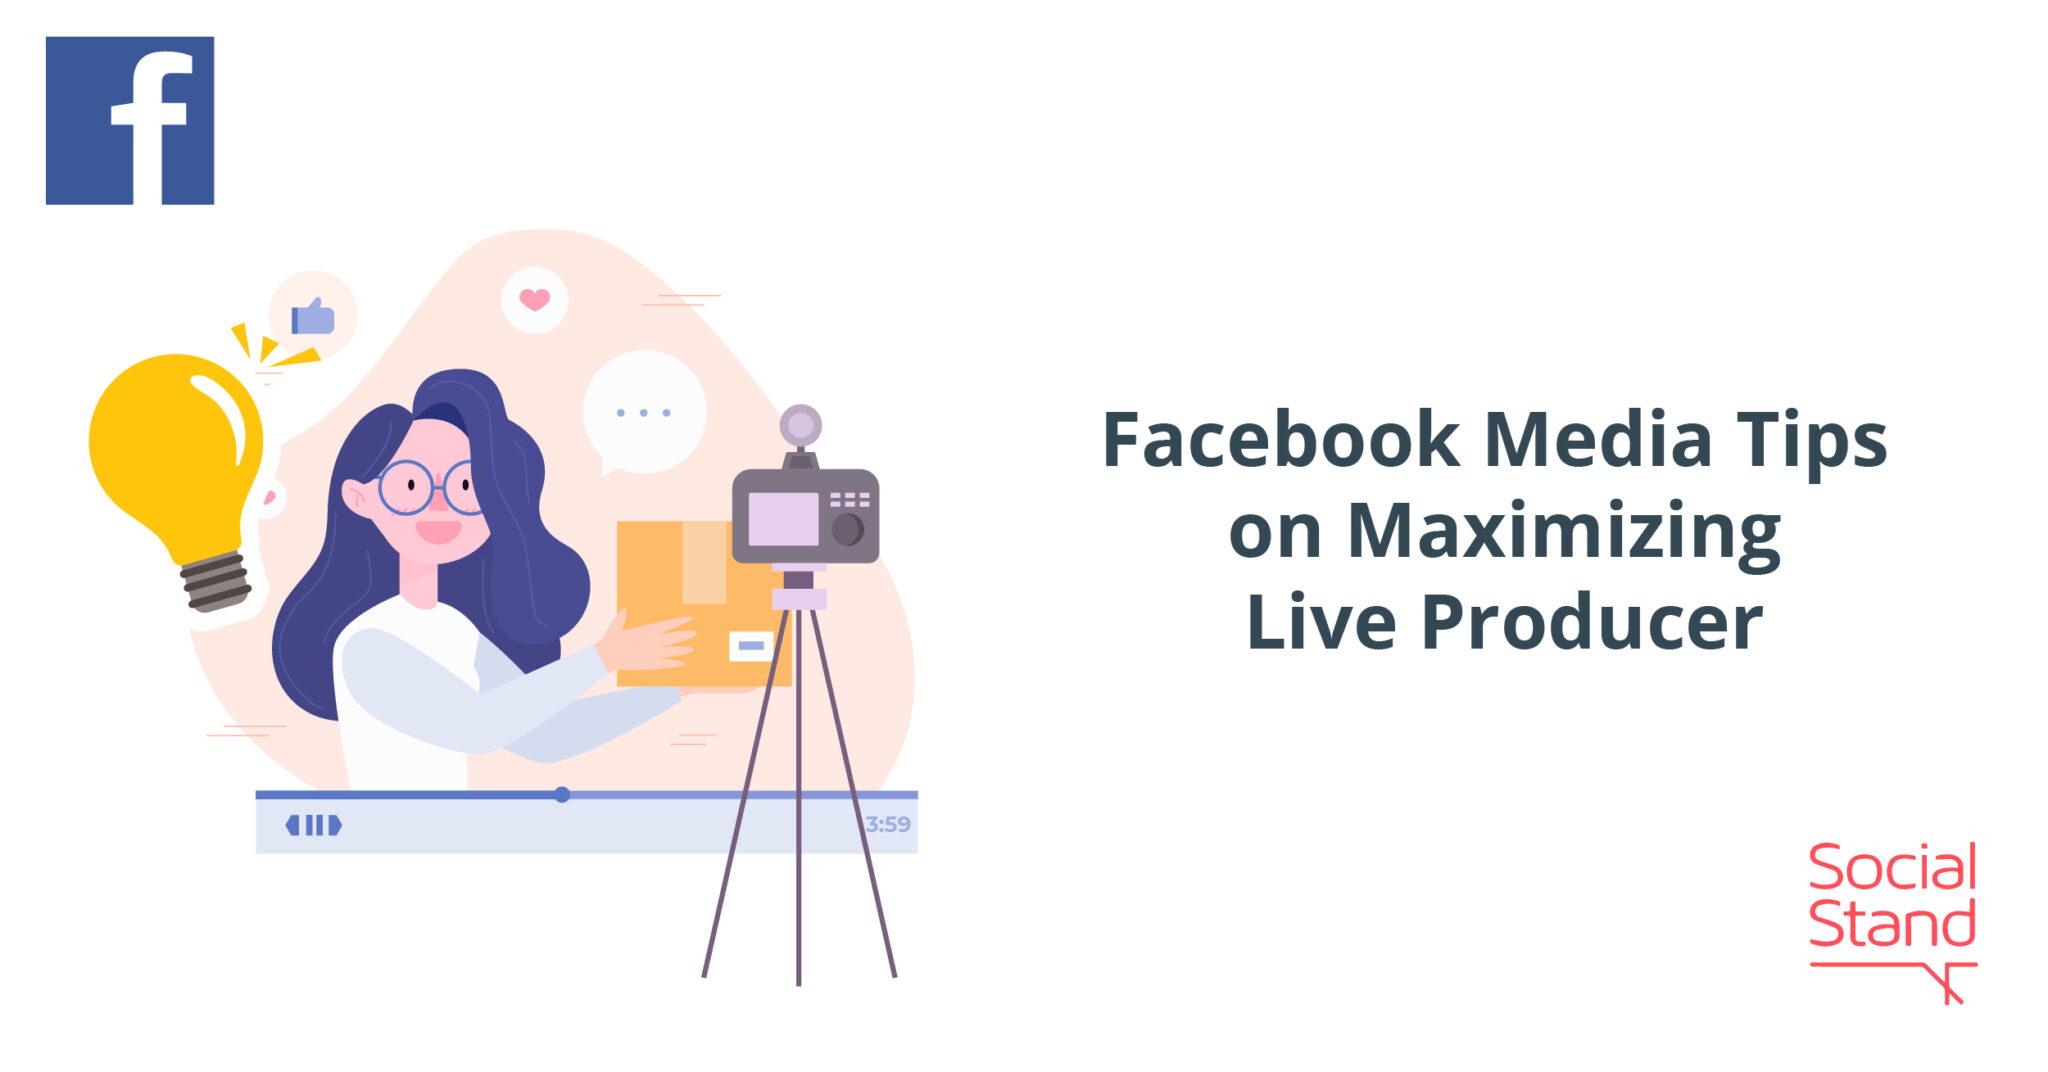 Facebook Media Tips on Maximizing Live Producer